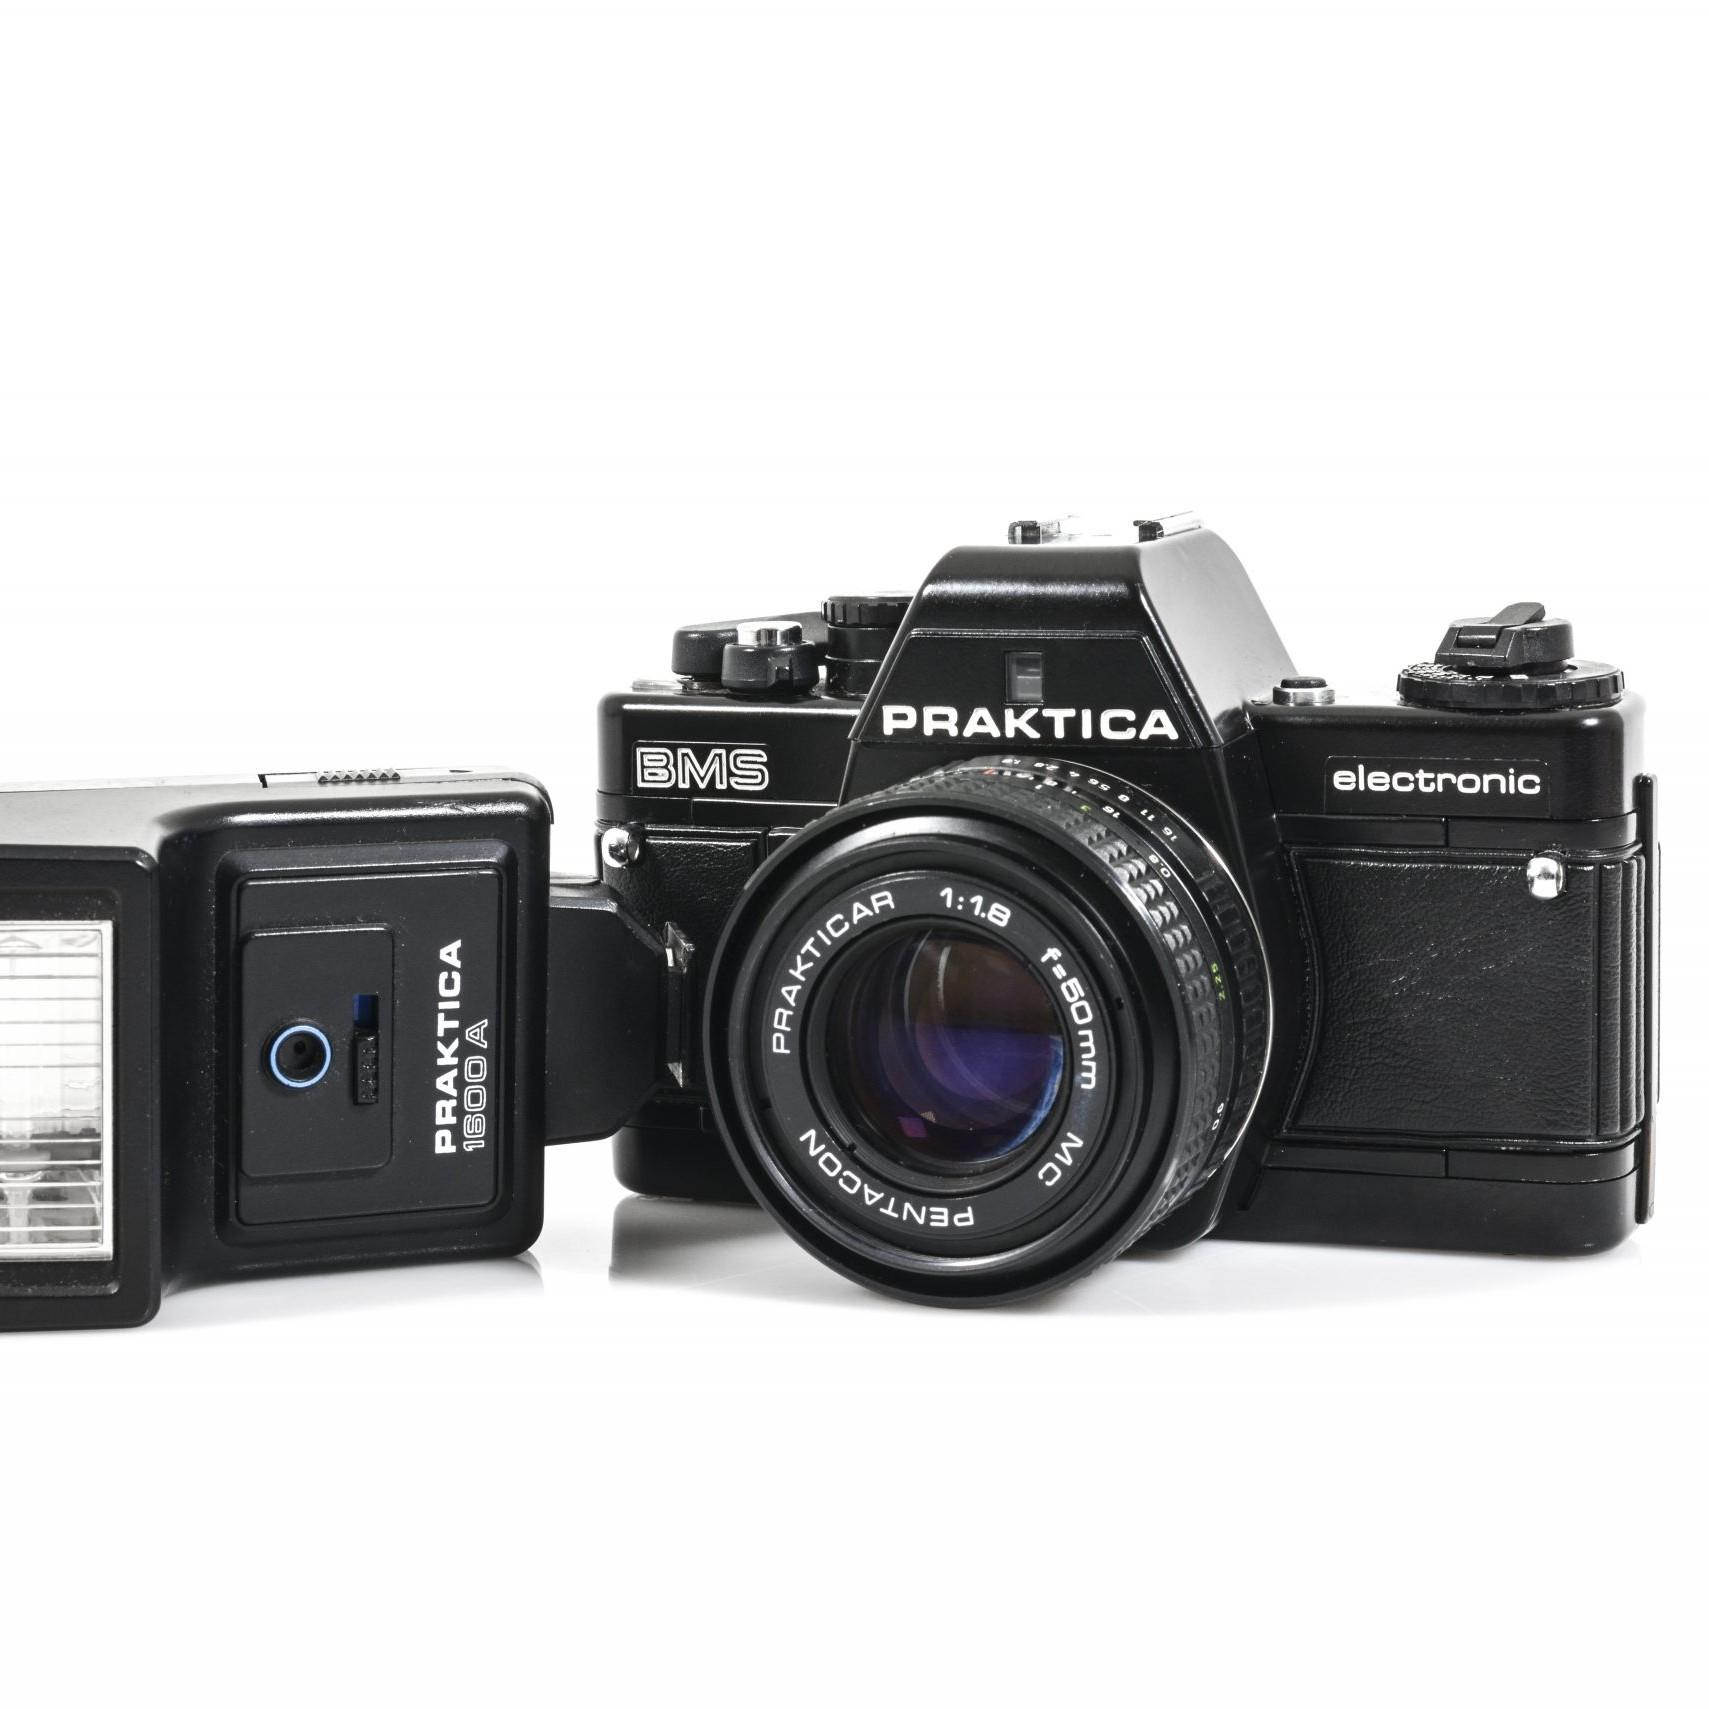 Immaculate Praktica BMS 35mm Film Camera with 50mm Lens + Flash Gun